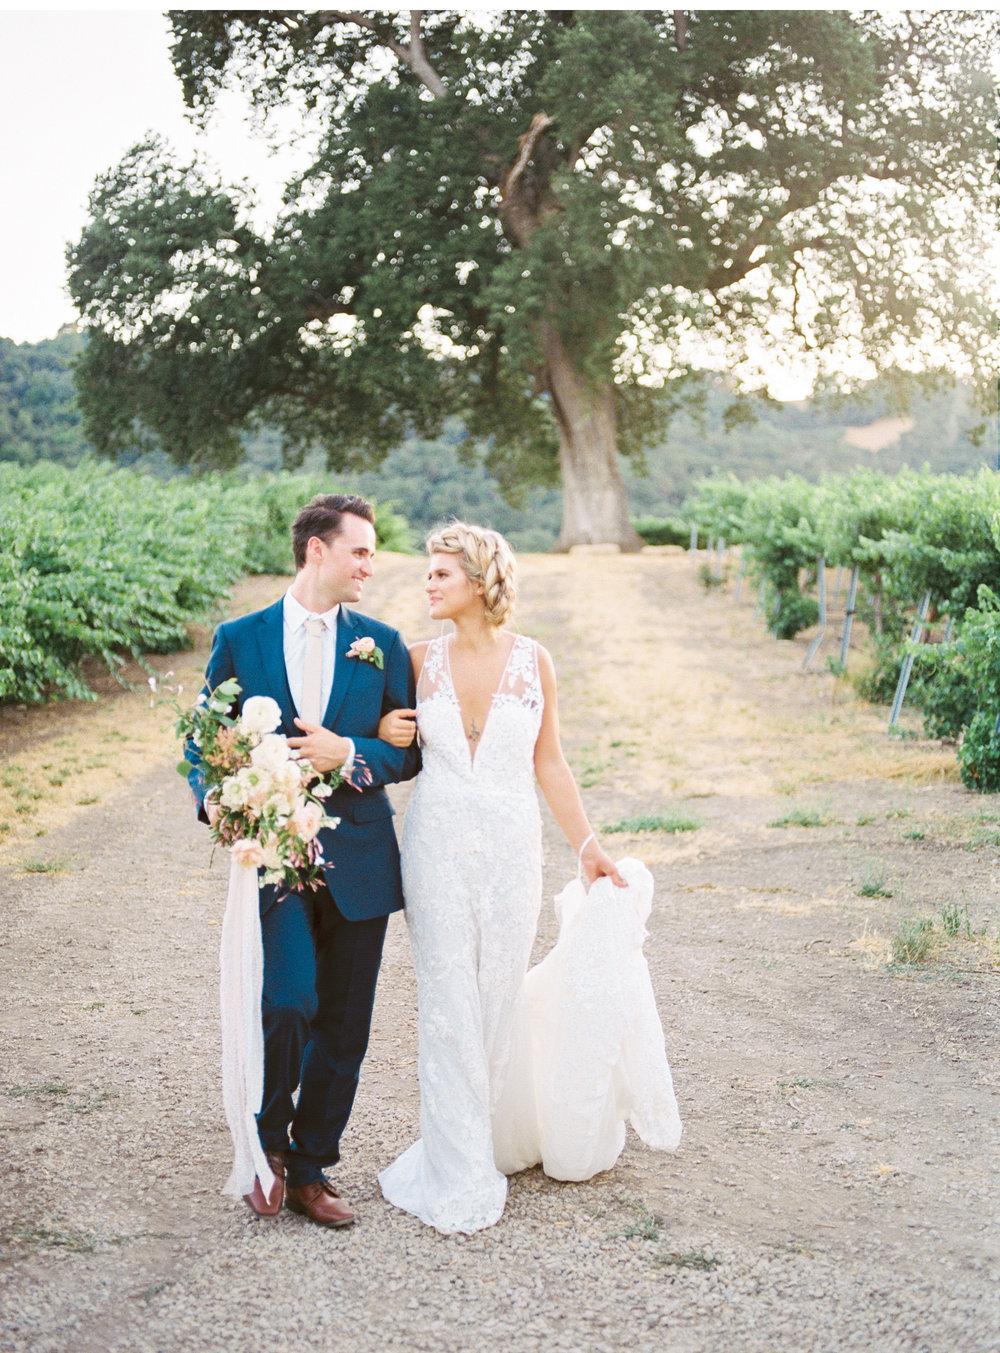 Malibu-Weddings-Natalie-Schutt-Photography_14.jpg